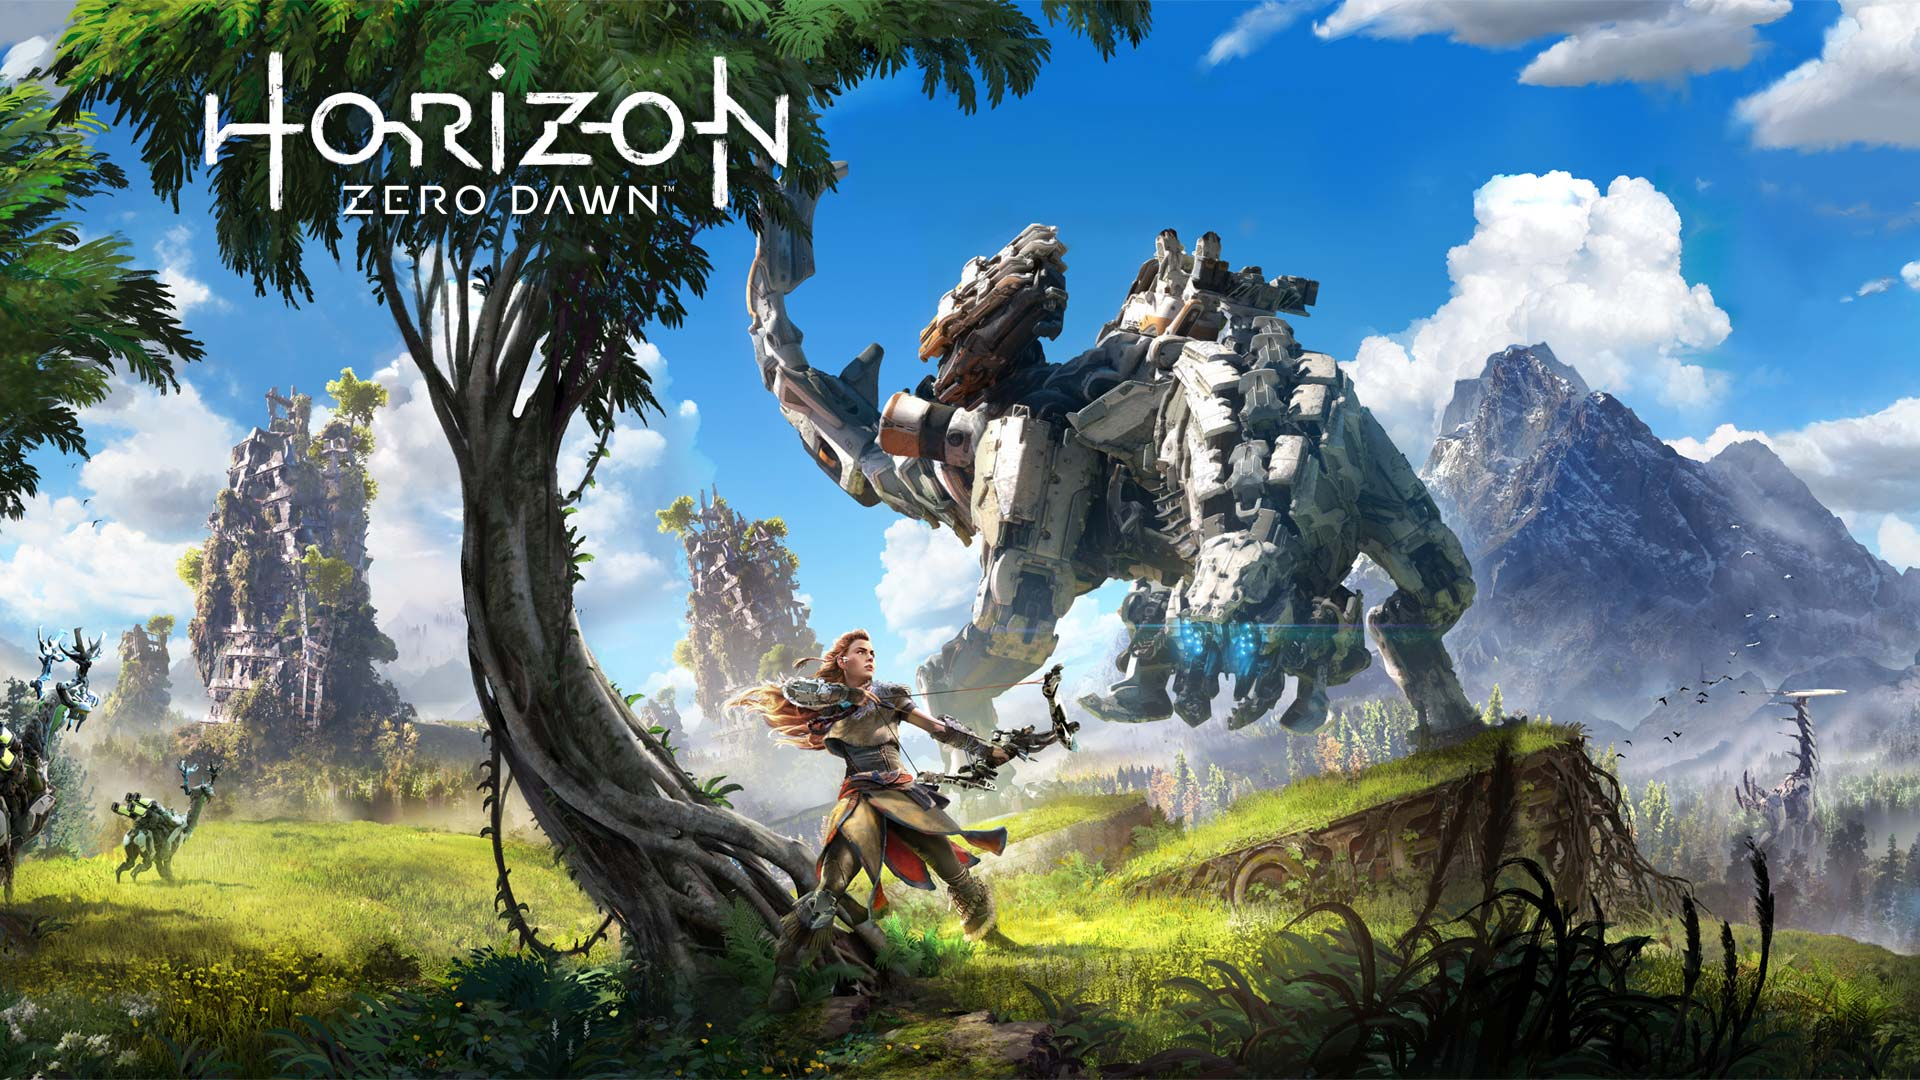 horizonzerodawn-feature.jpg